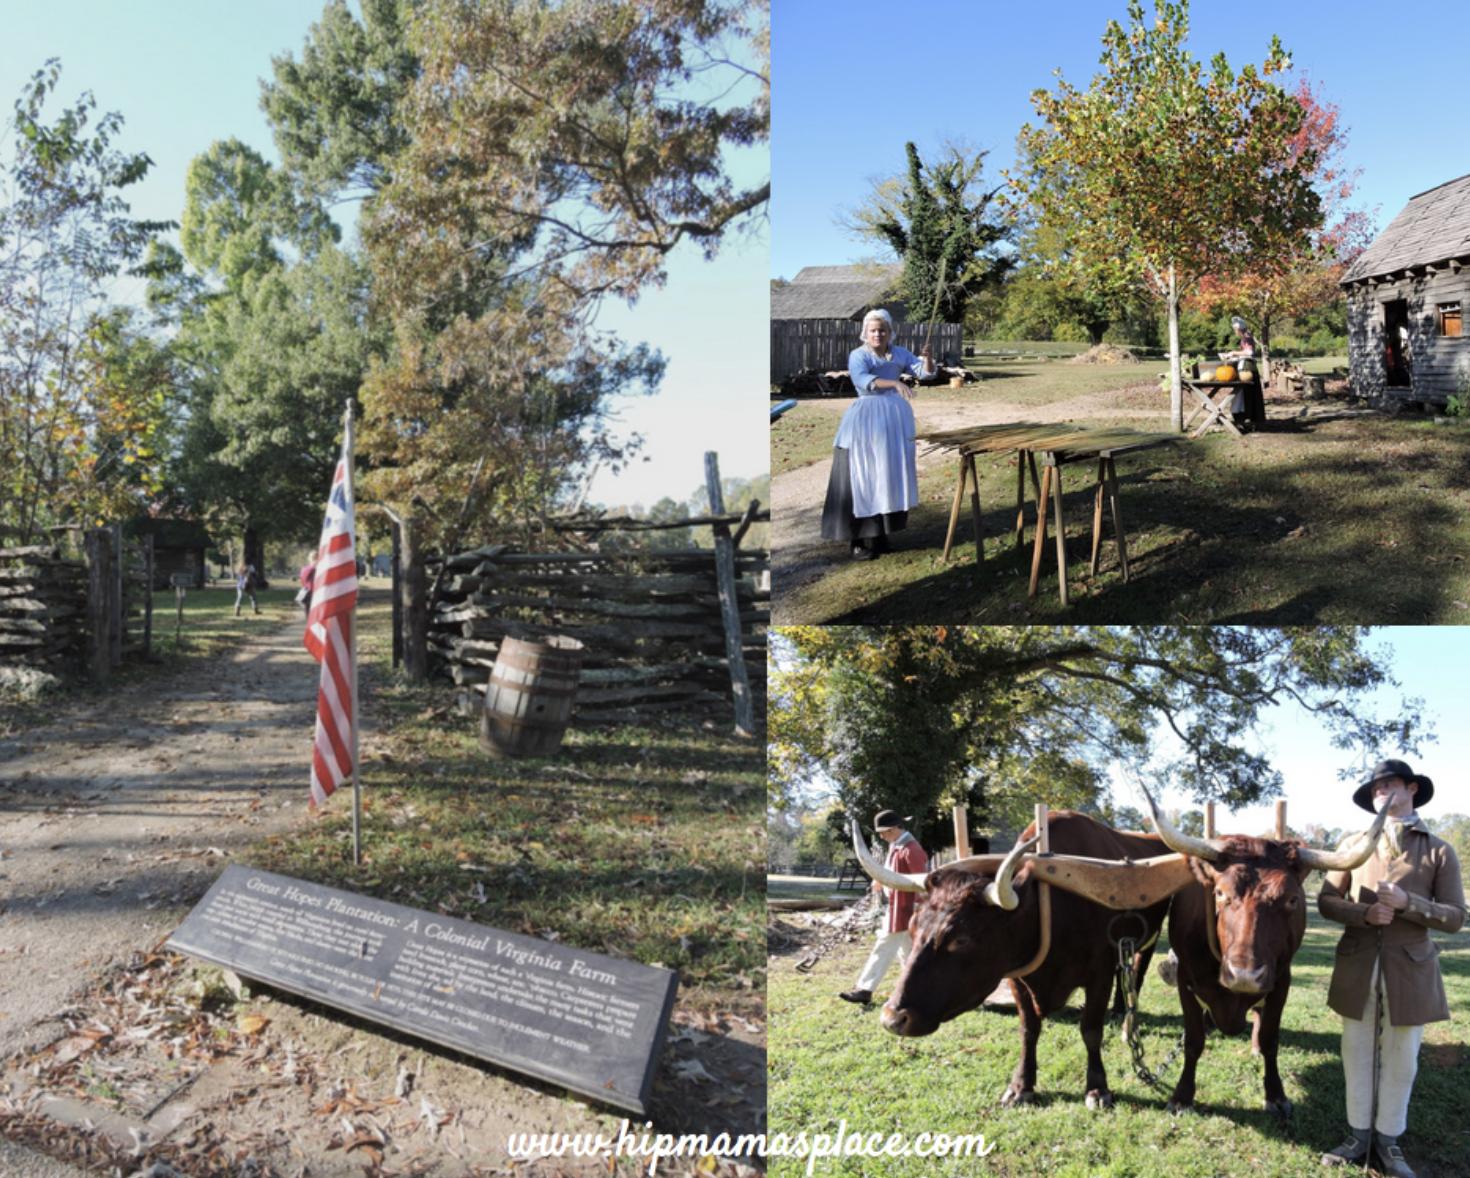 Chocolate History Tour in Williamsburg, Virginia